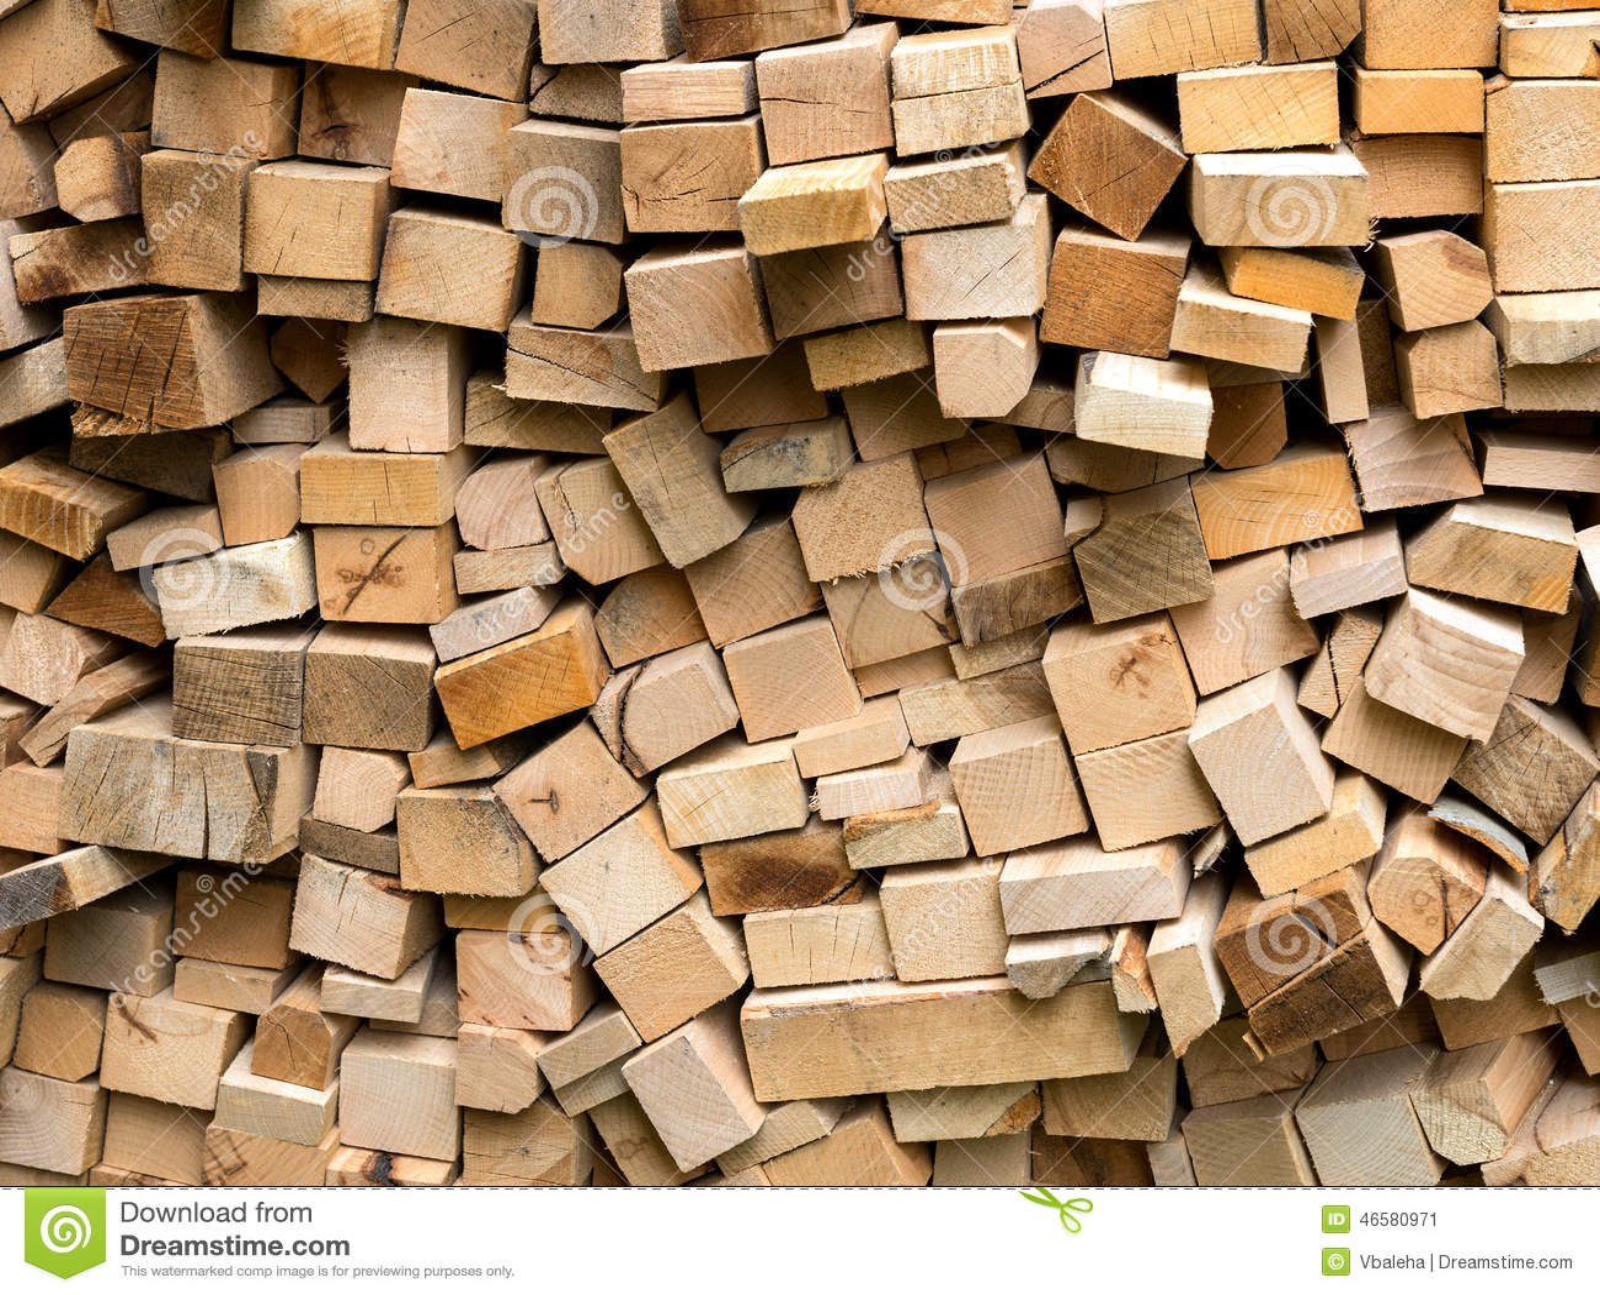 Cut Wood Logs ~ Pile of fresh cut wood logs stock image